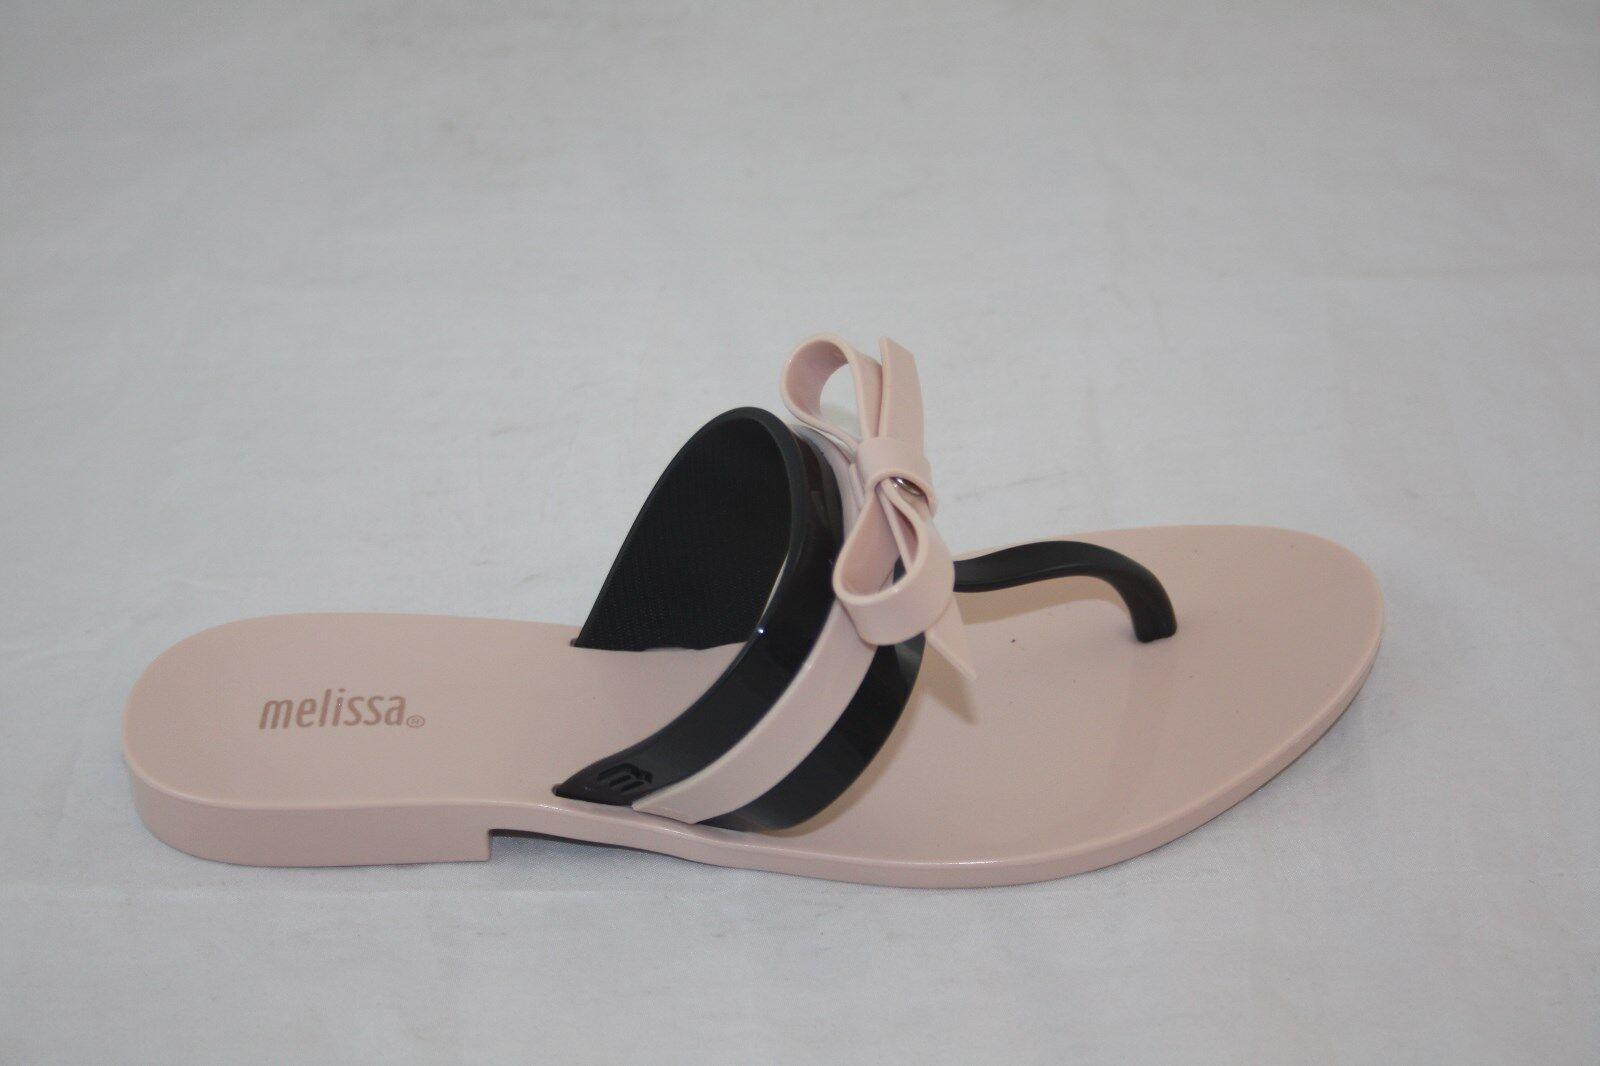 NEW WMNS 31681 MELISSA BLACK GAROTA AD 51647 PINK BLACK MELISSA BOW THONG SANDAL 06616c